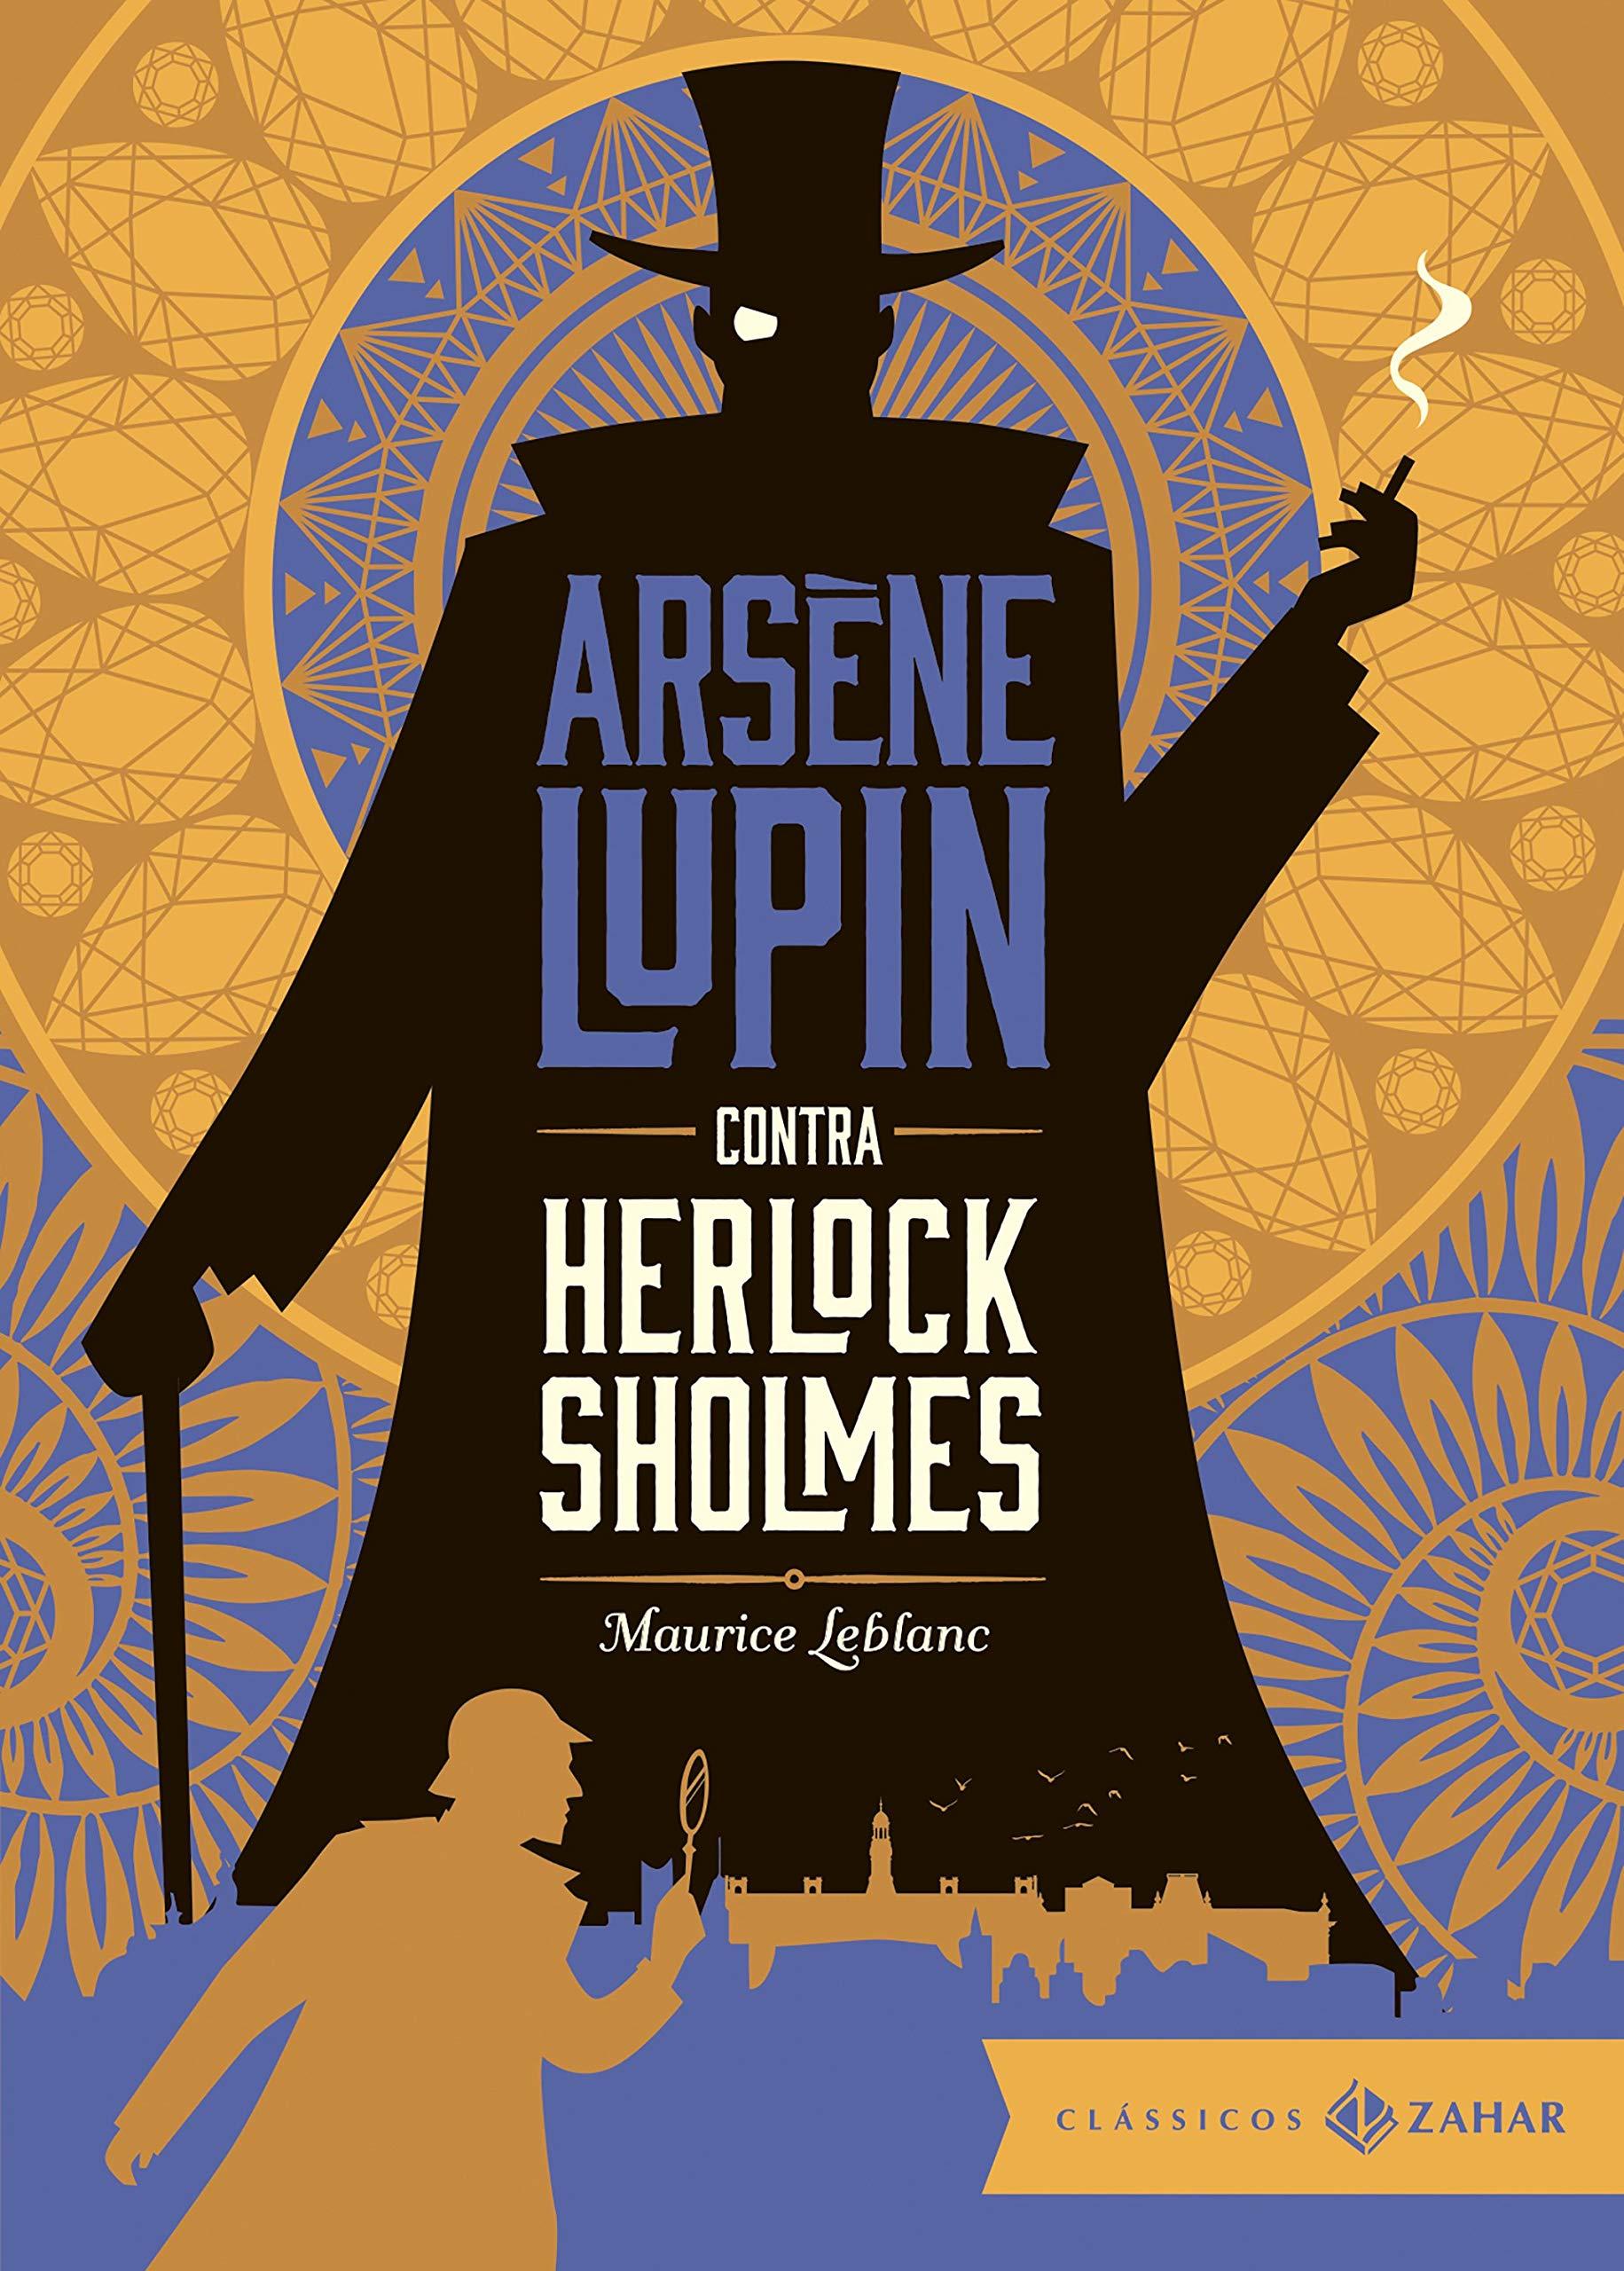 Arsène Lupin contra Herlock Sholmes - Maurice Leblanc